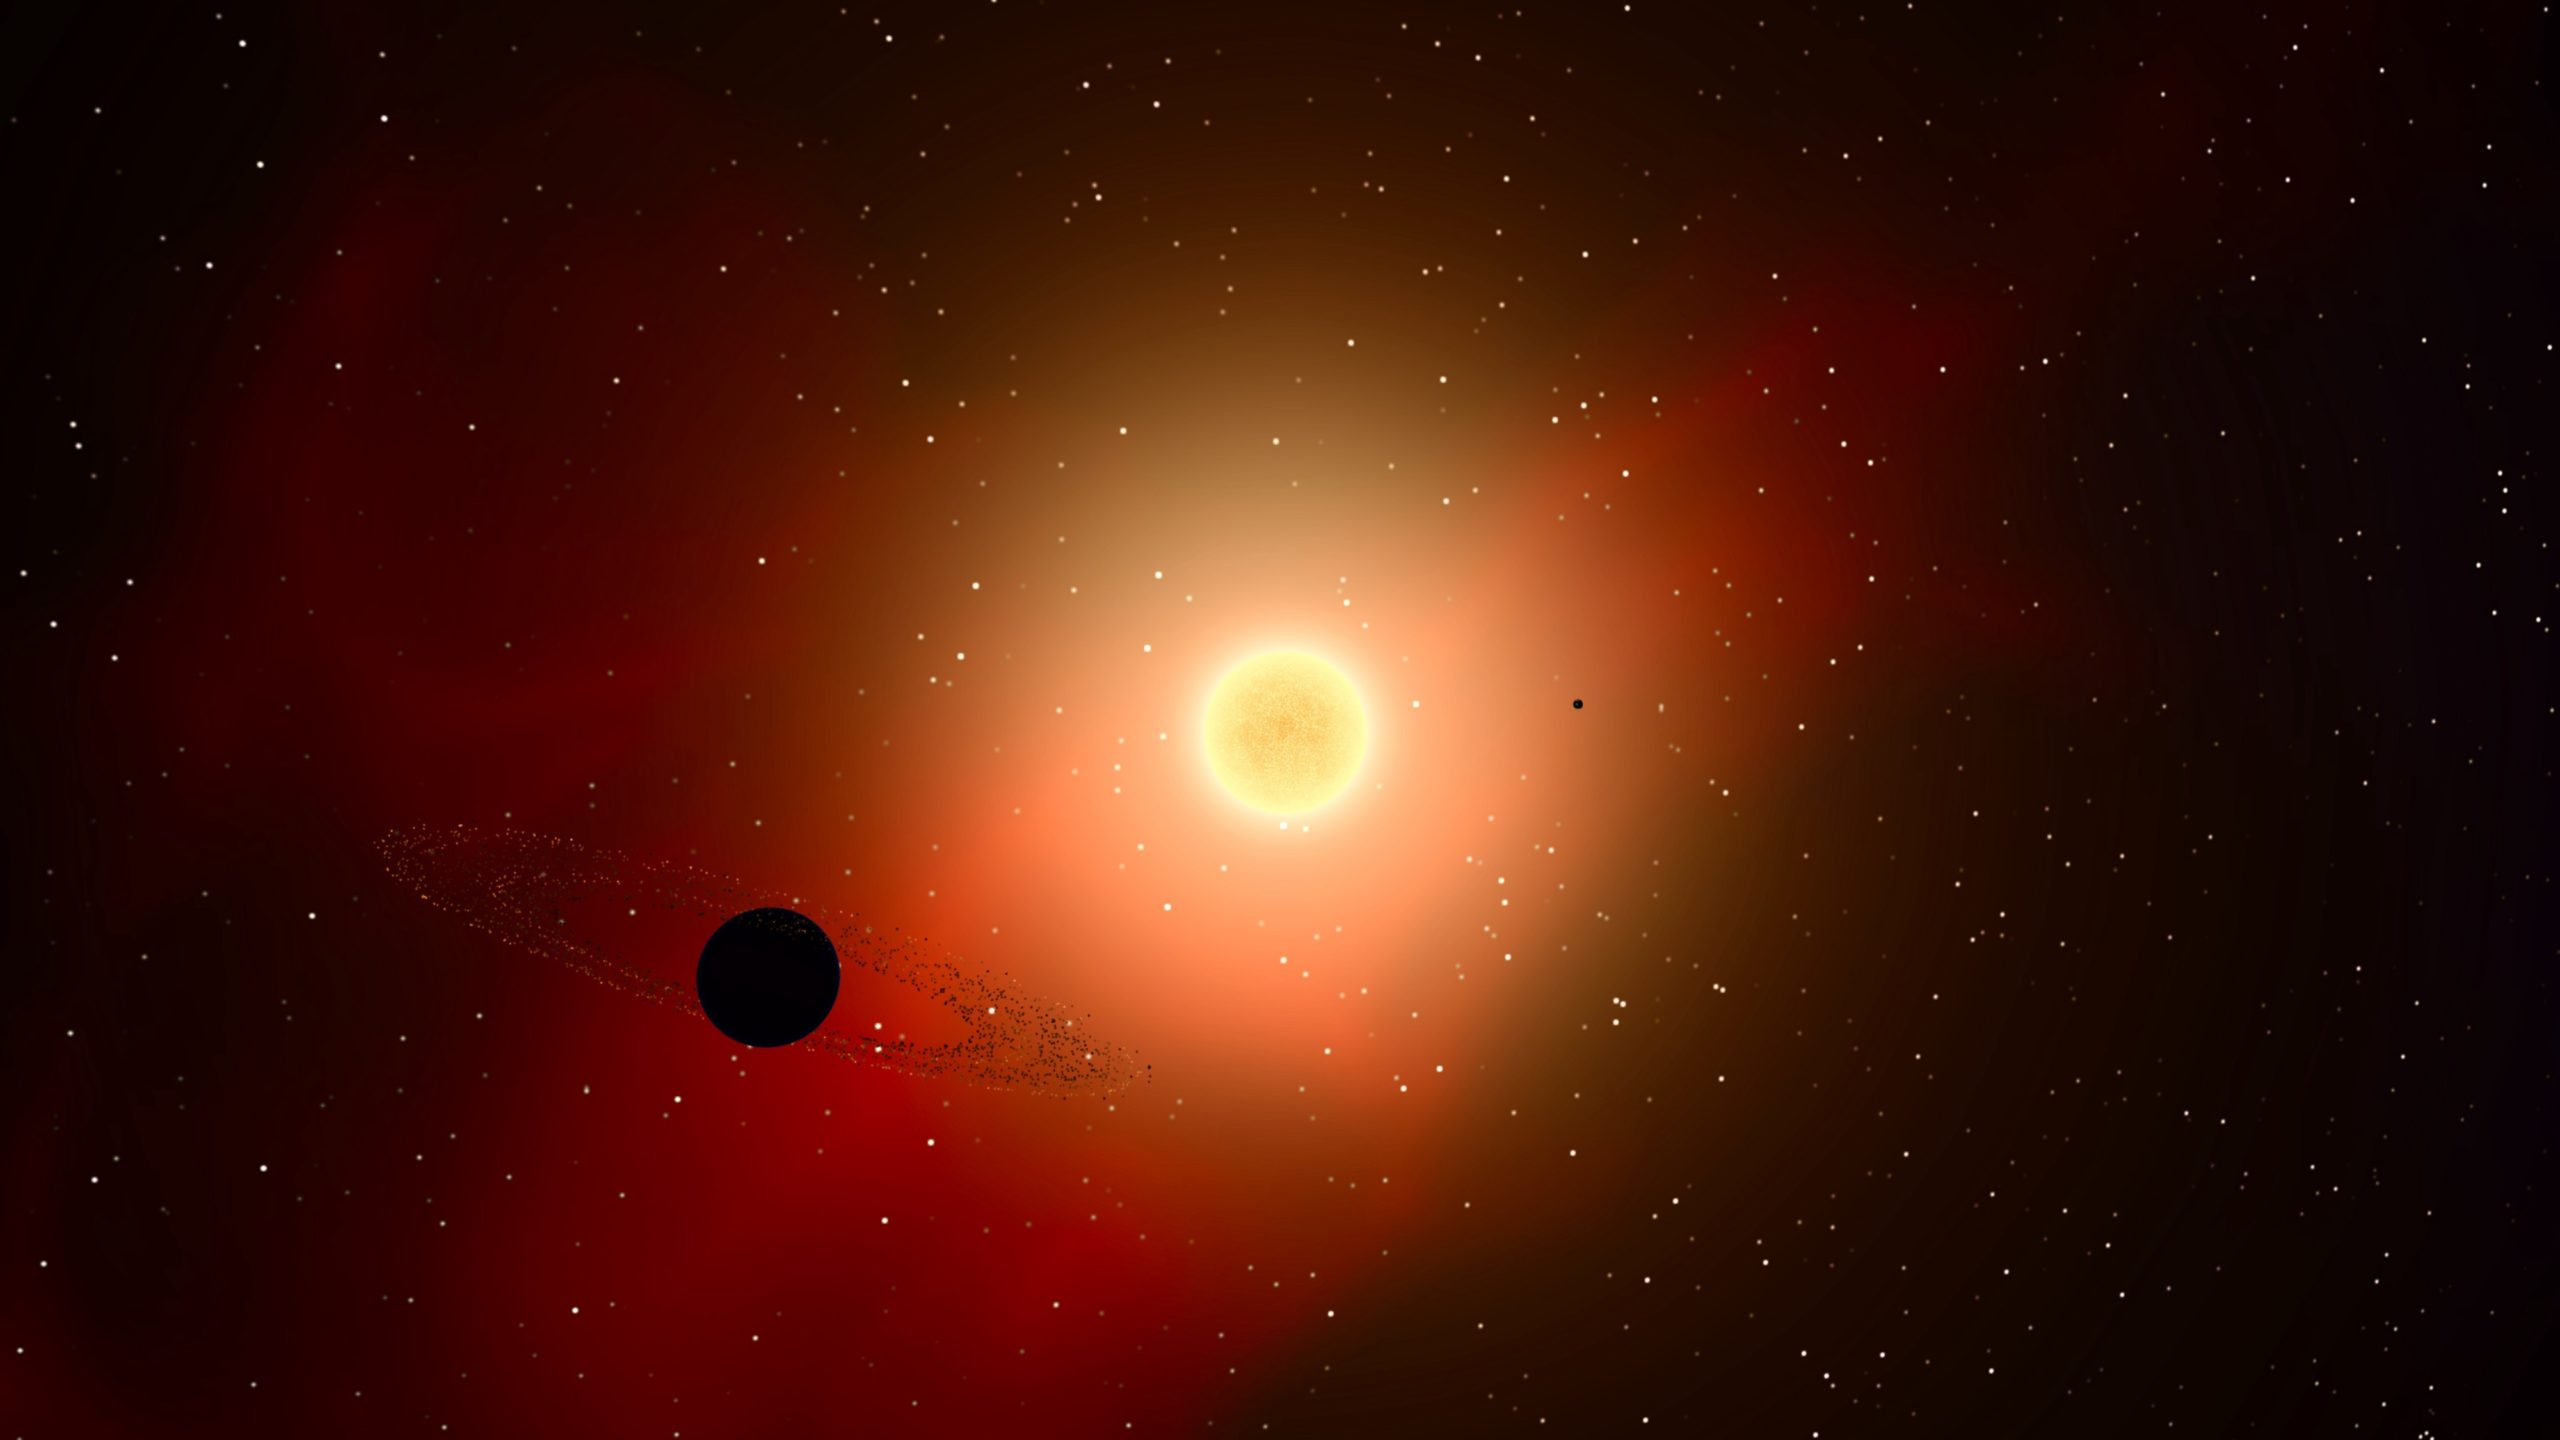 Star system Proxima Centauri